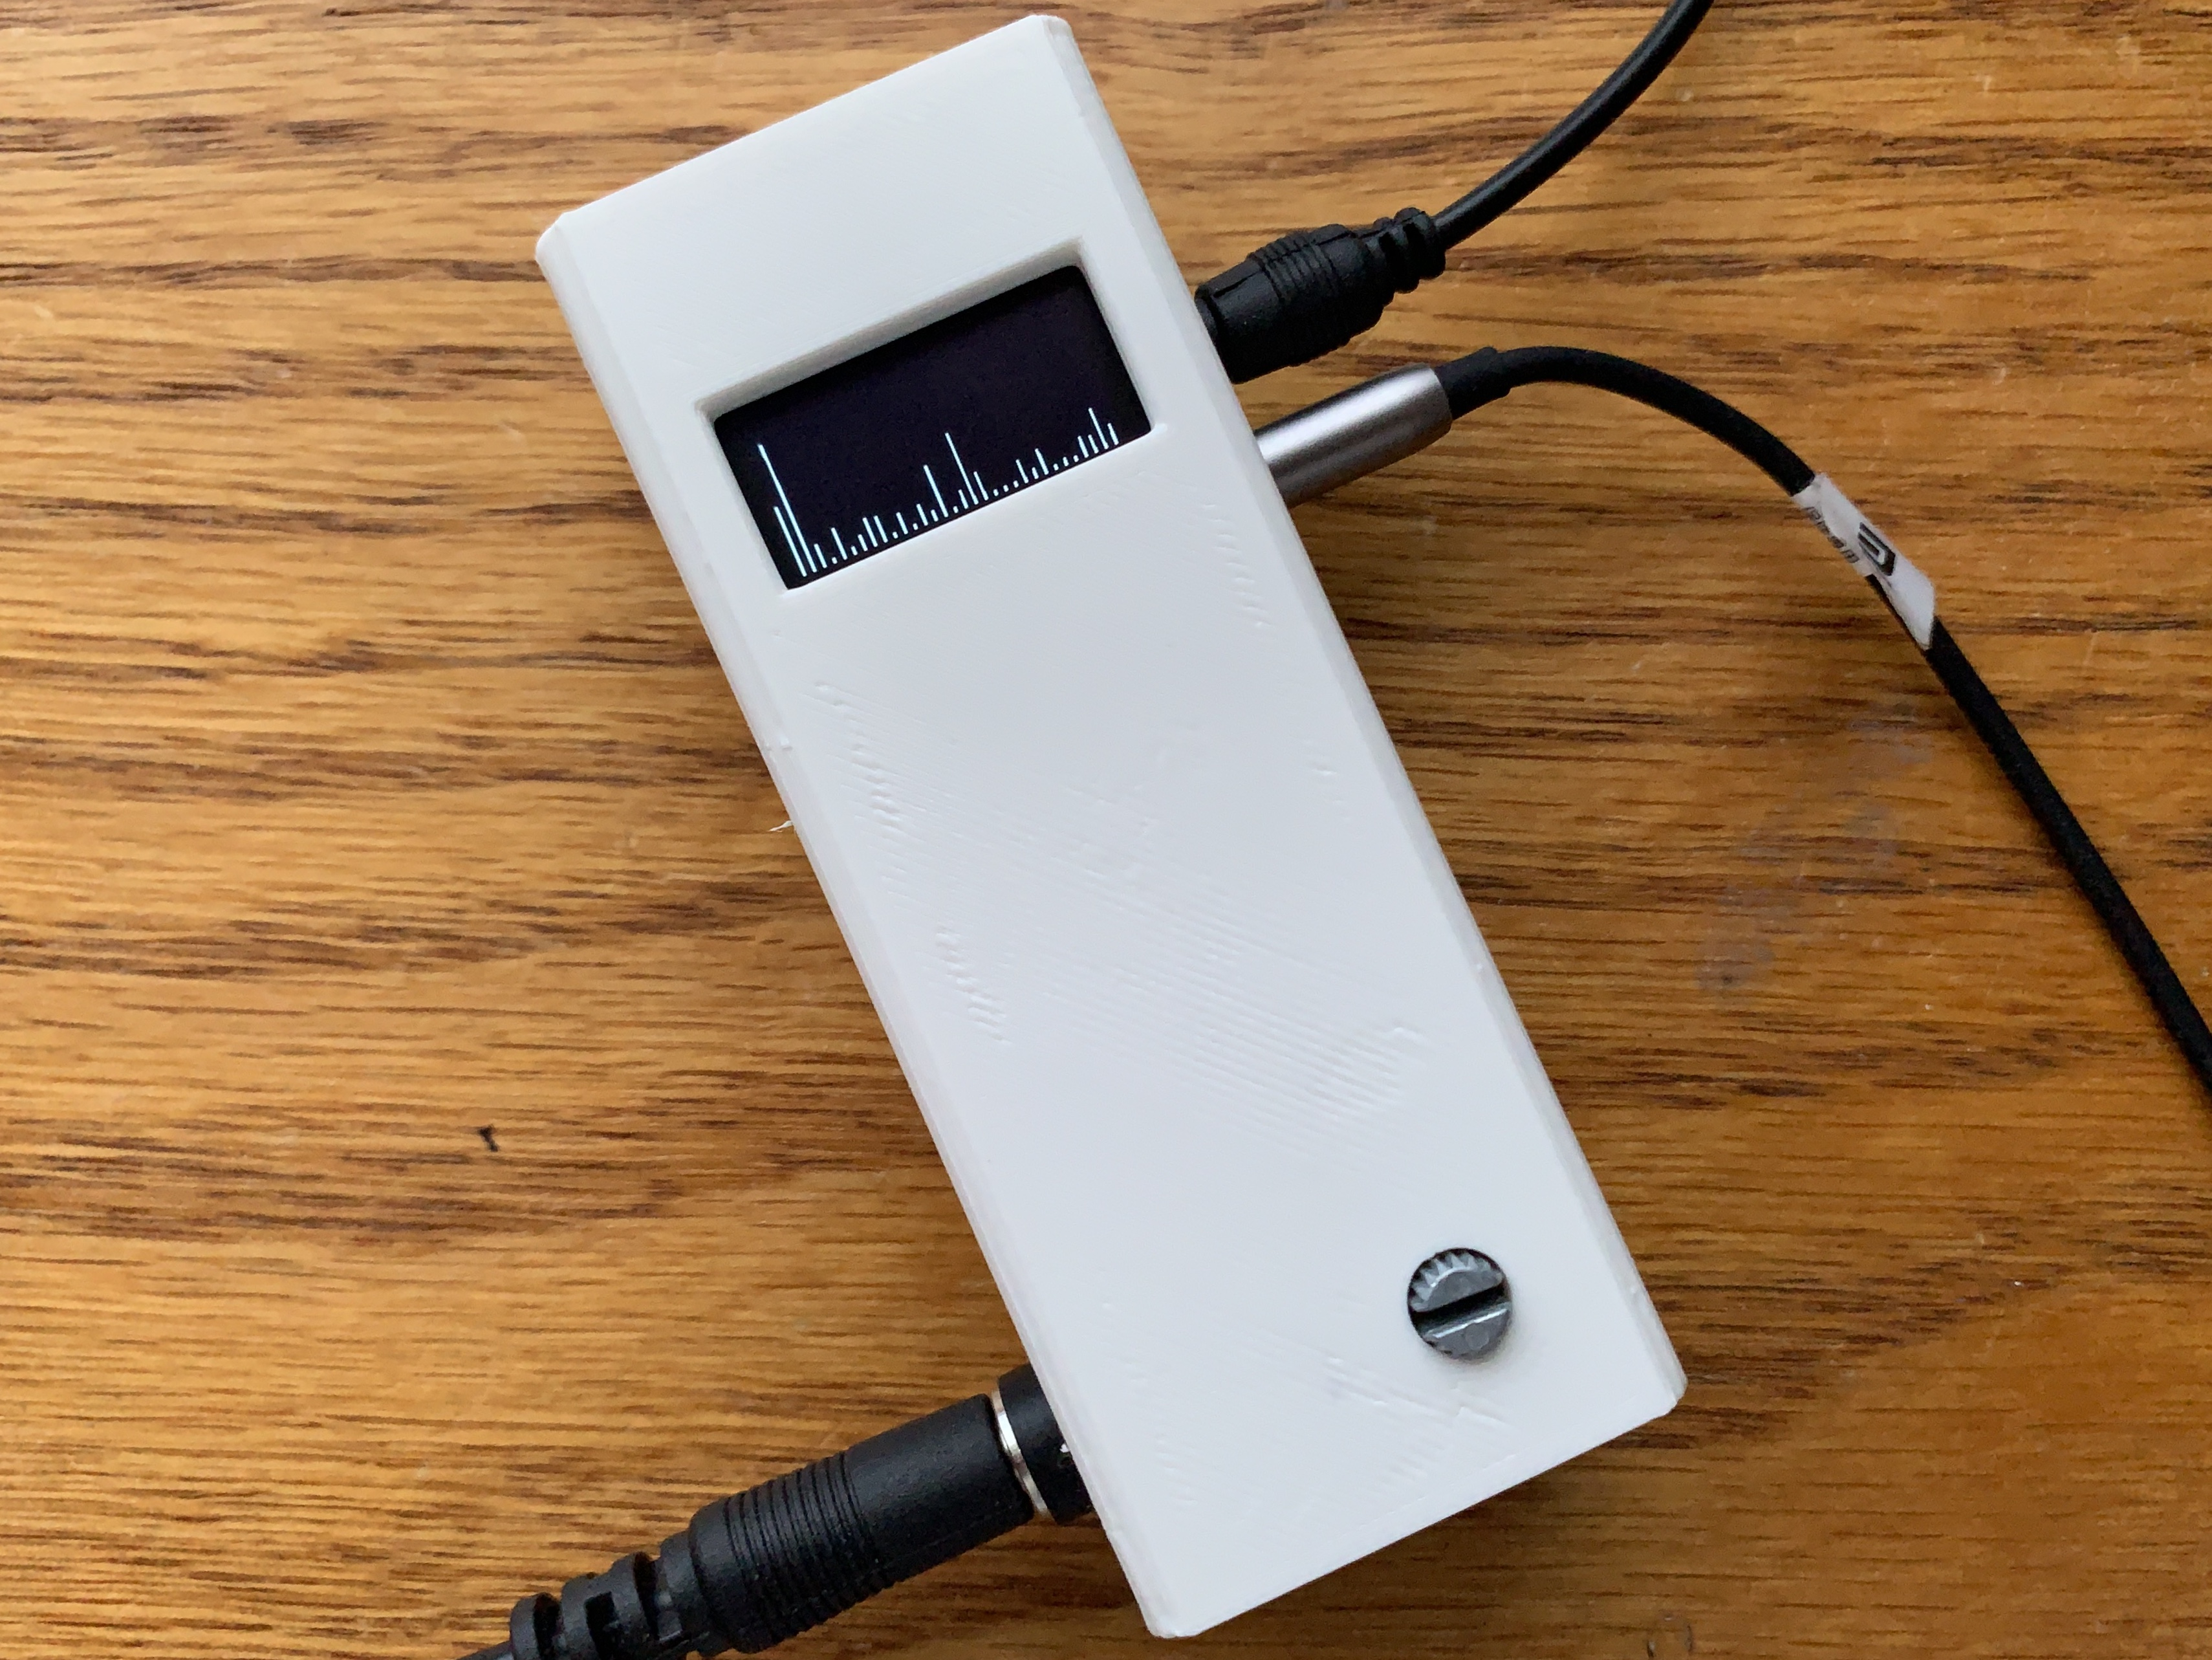 32 band audio visualizer using an ATTiny85